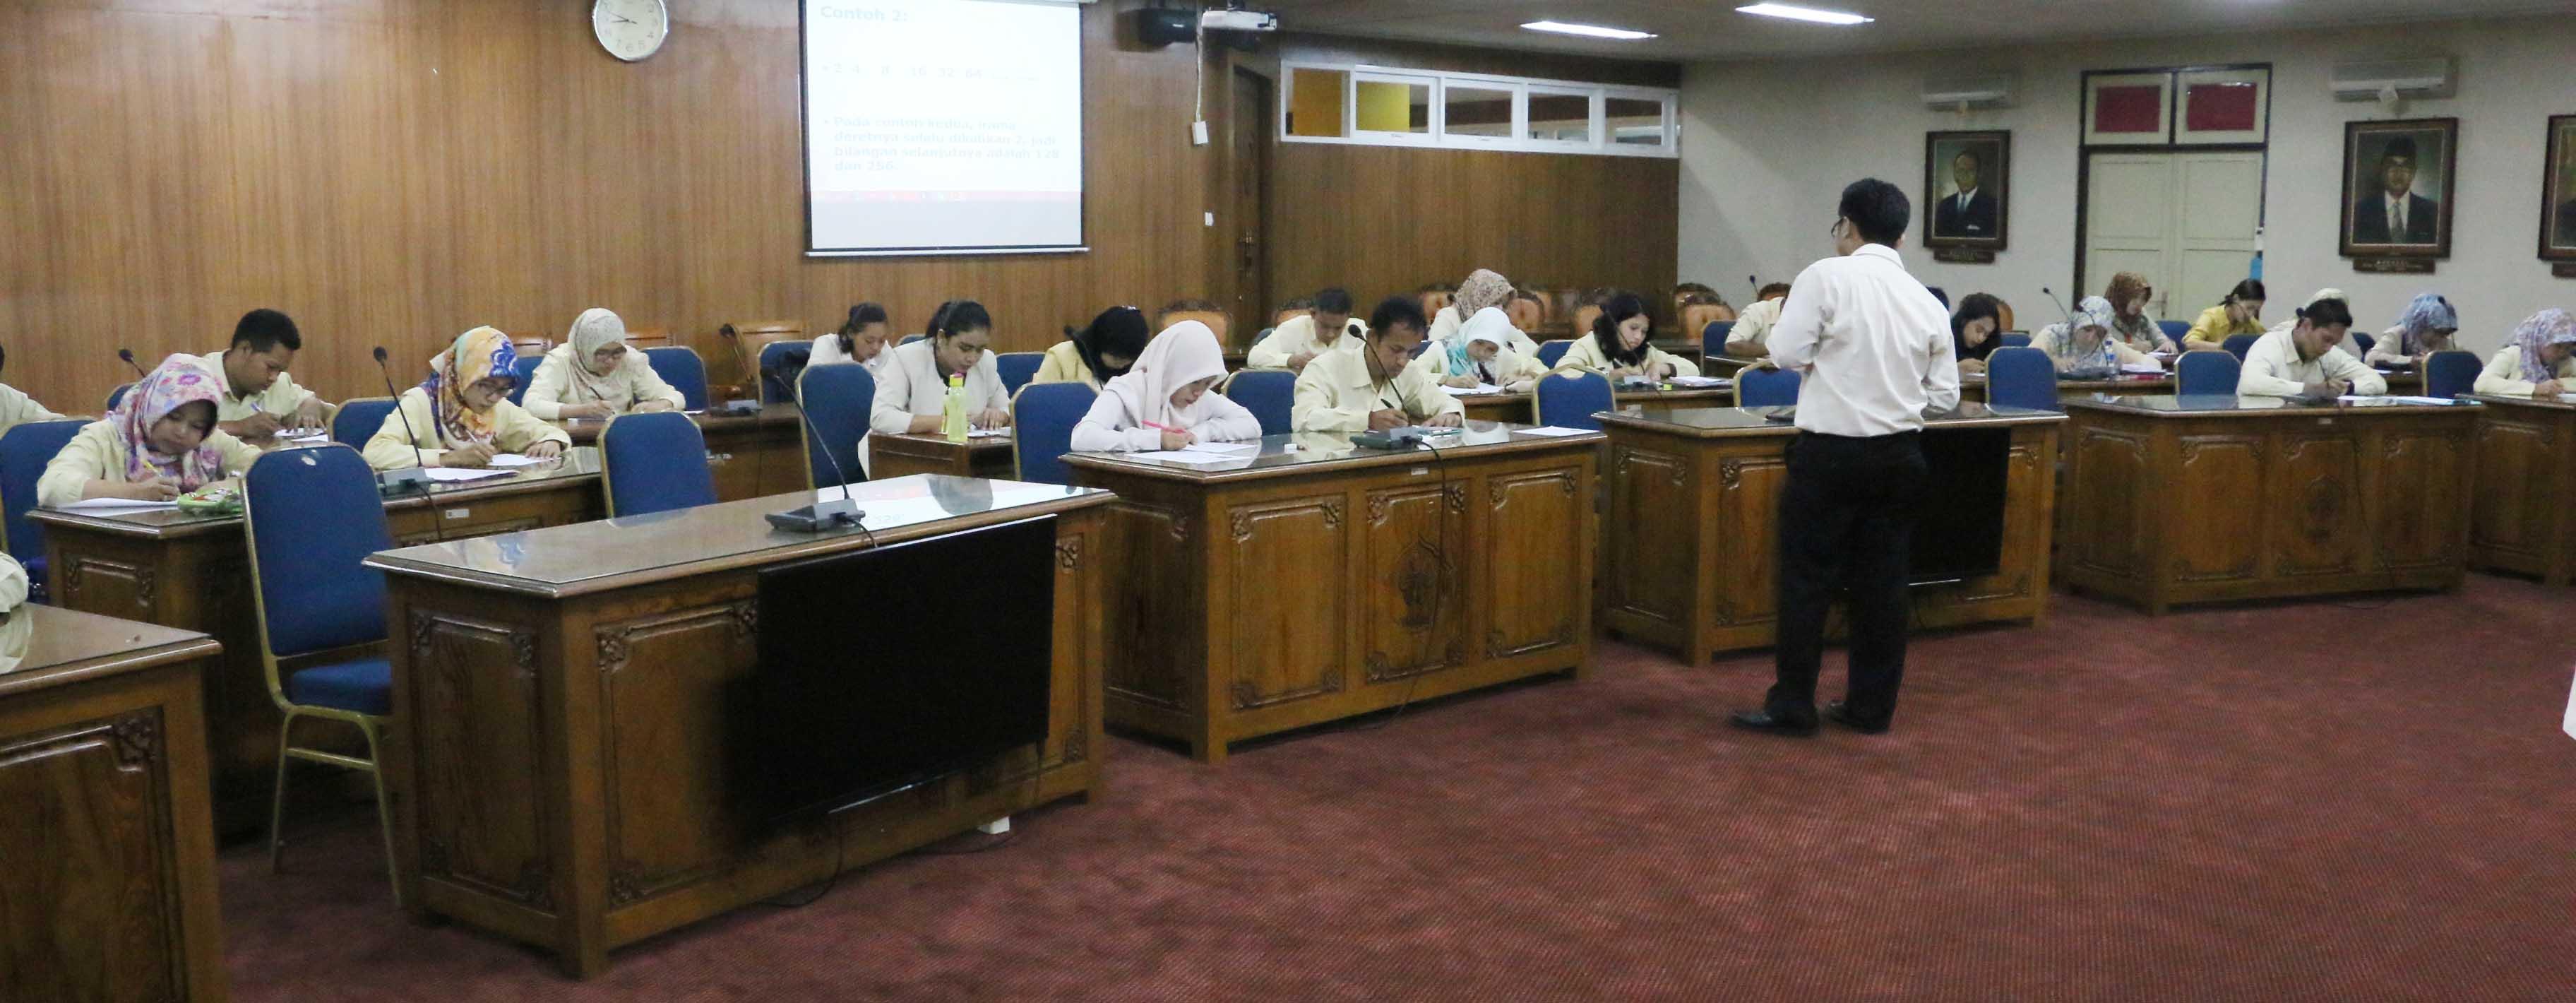 124 Orang Berebut Kursi Jadi Pegawai Tetap Non PNS Unnes